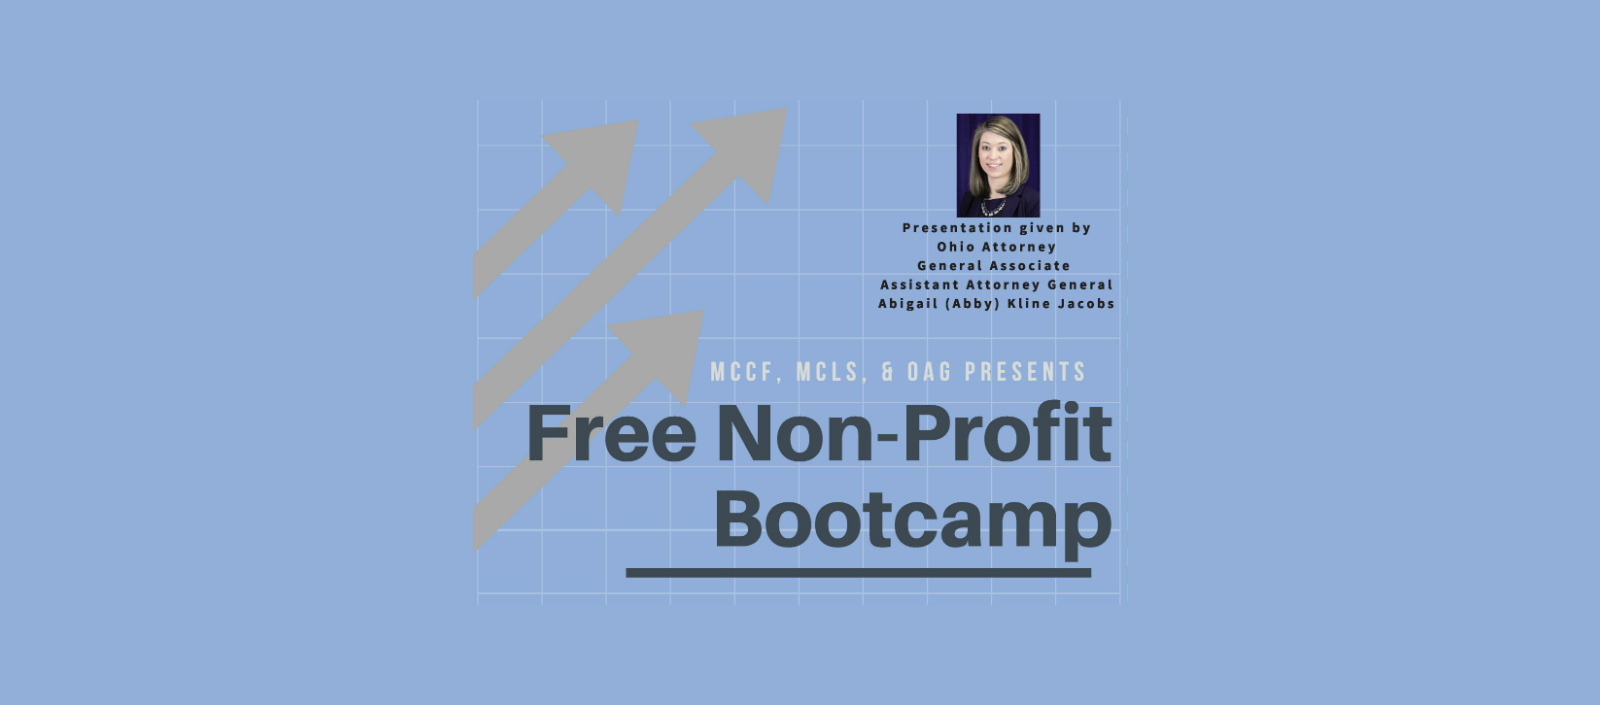 Free Non-Profit Bootcamp